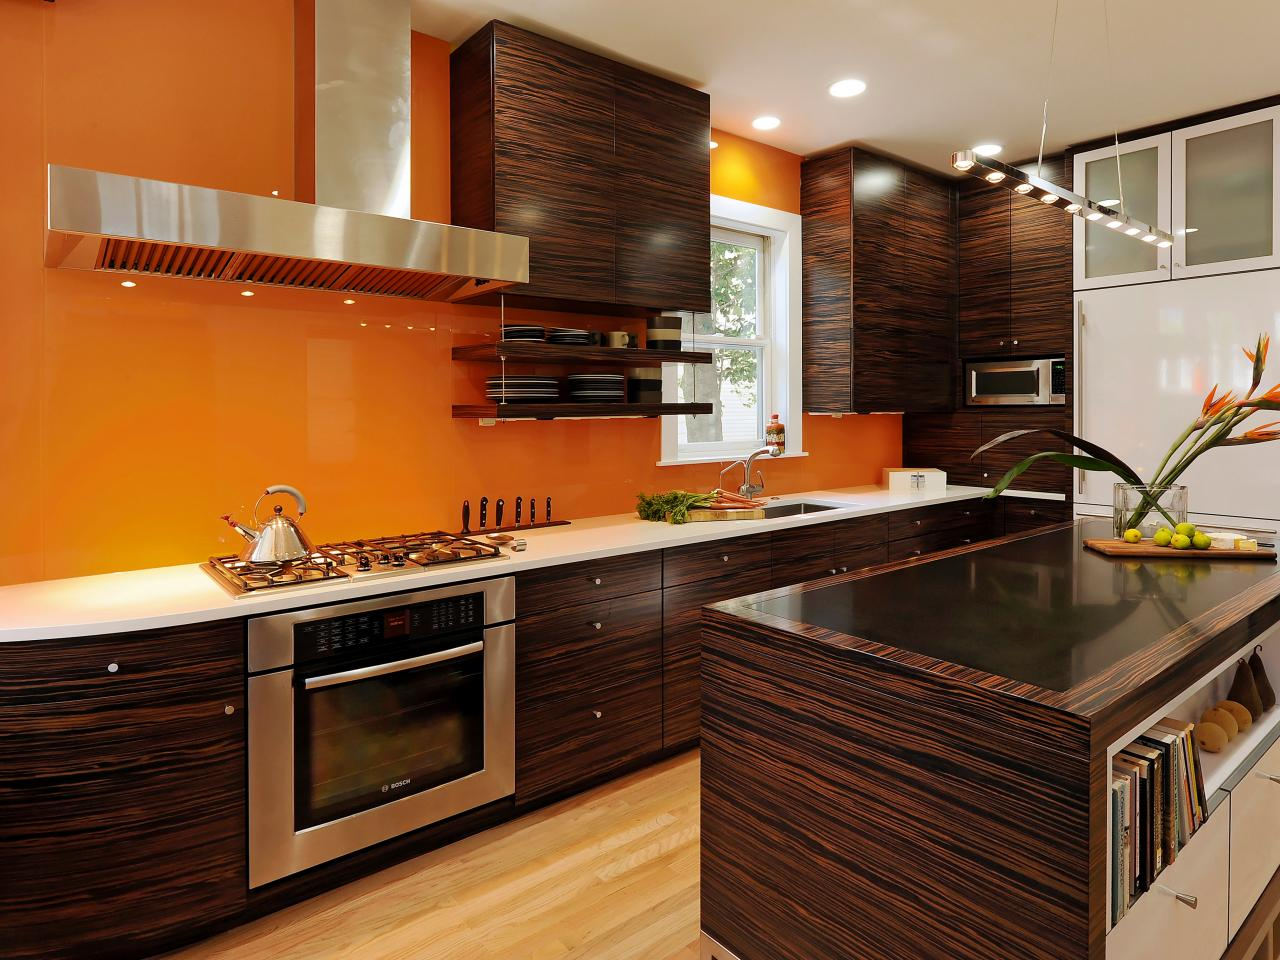 original_kitchen-countertops-armoires-jennifer-gilmer_s4x3-jpg-rend-hgtvcom-1280-960